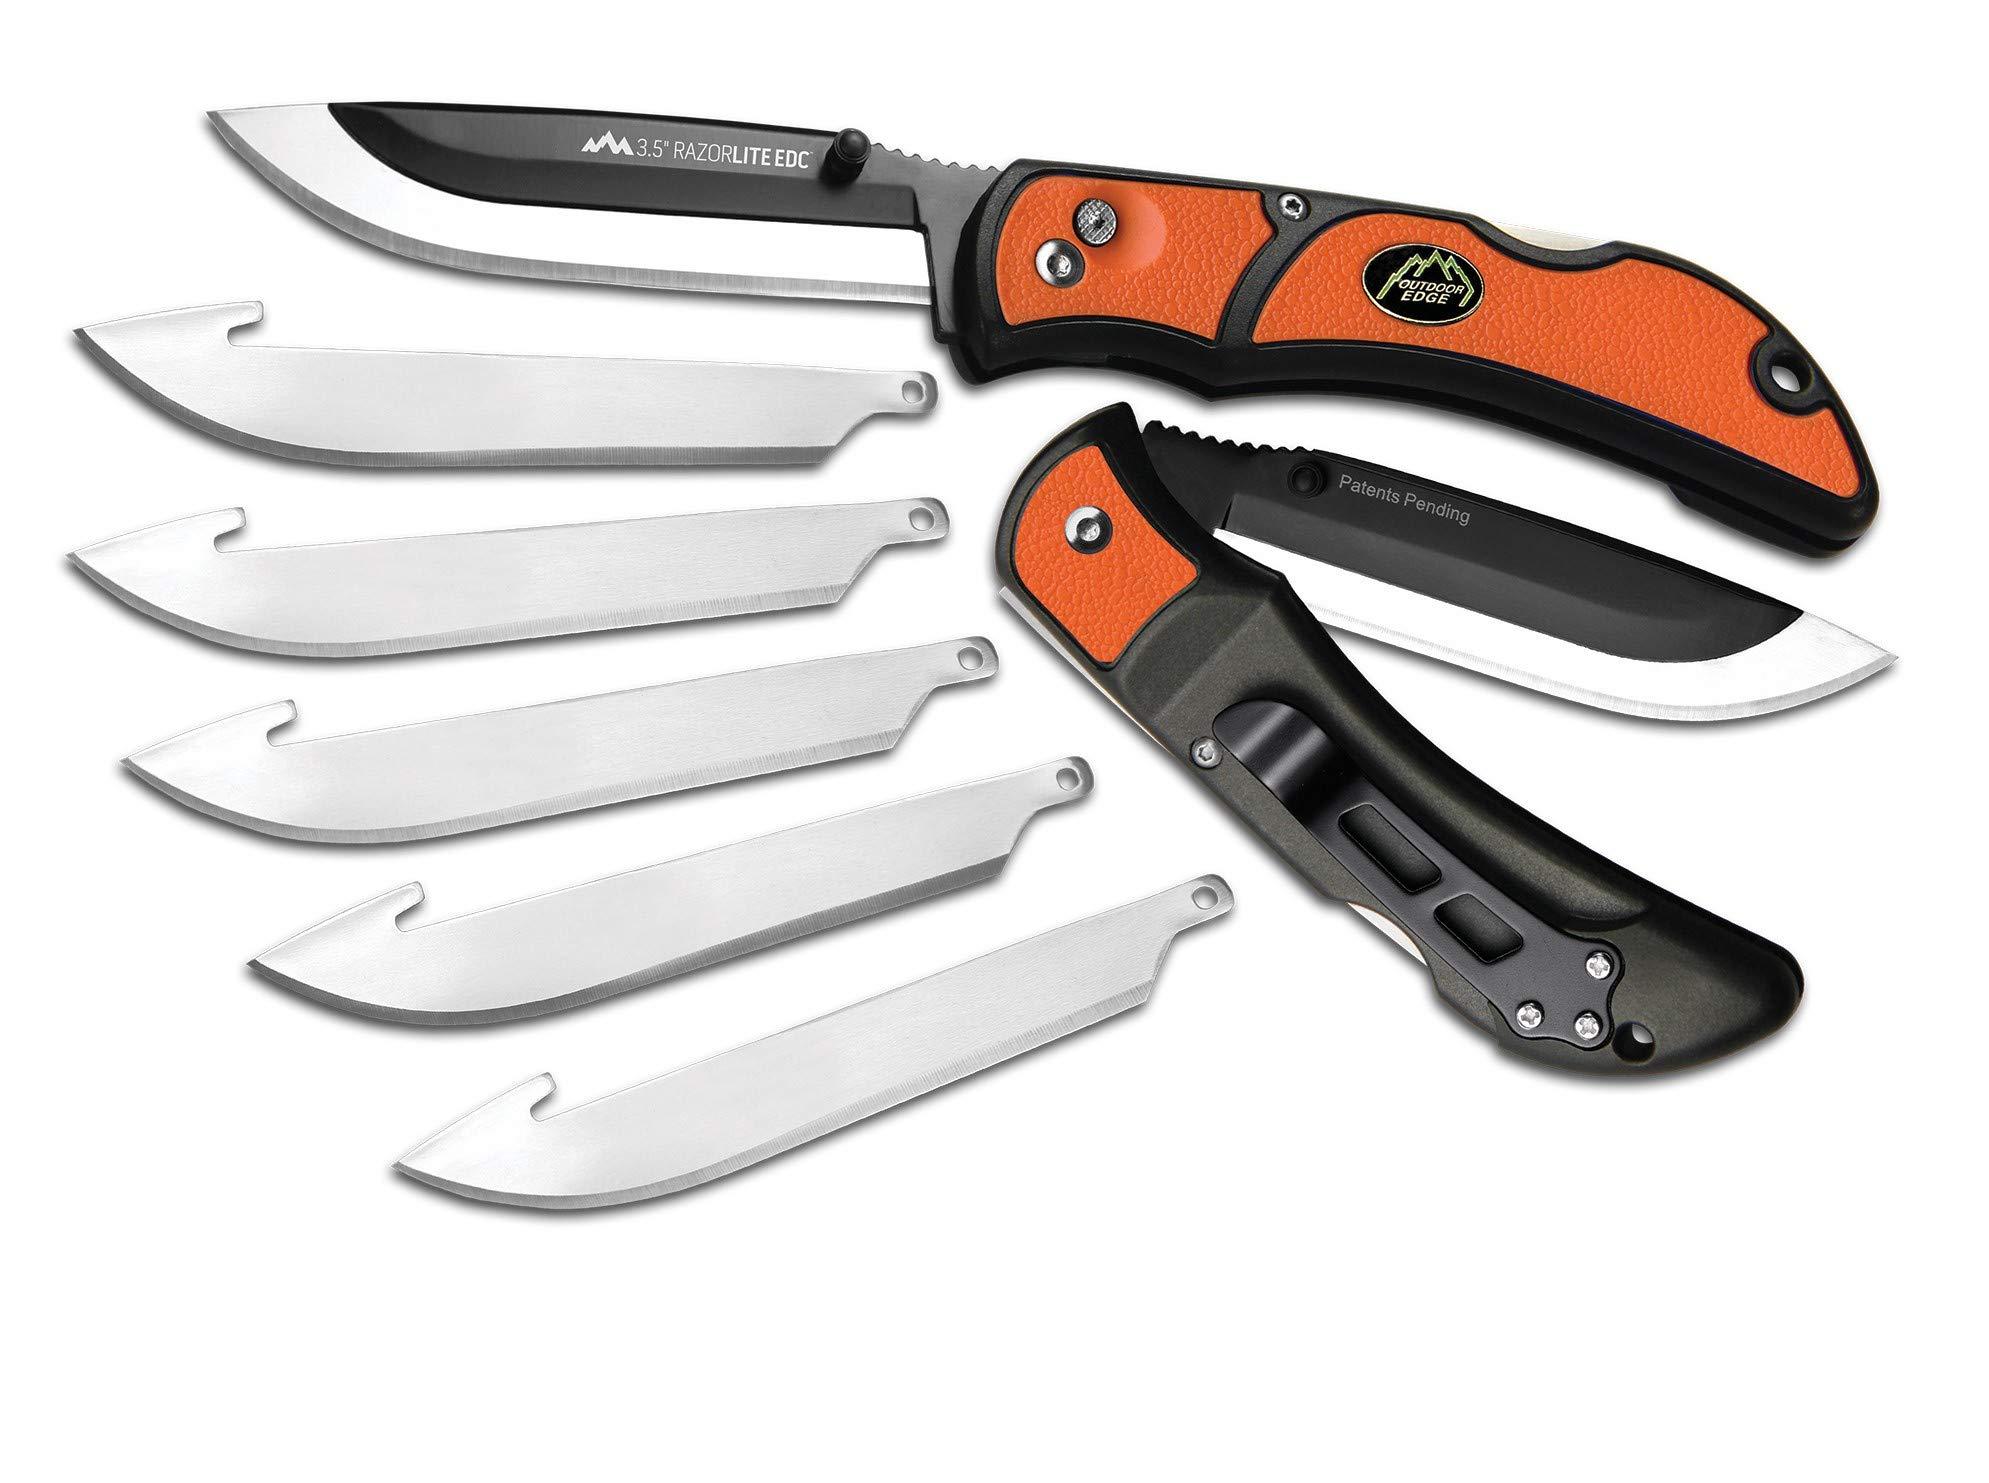 Outdoor Edge Razor-Lite EDC Folding Knives (3.5 - Inch, Orange) by Outdoor Edge